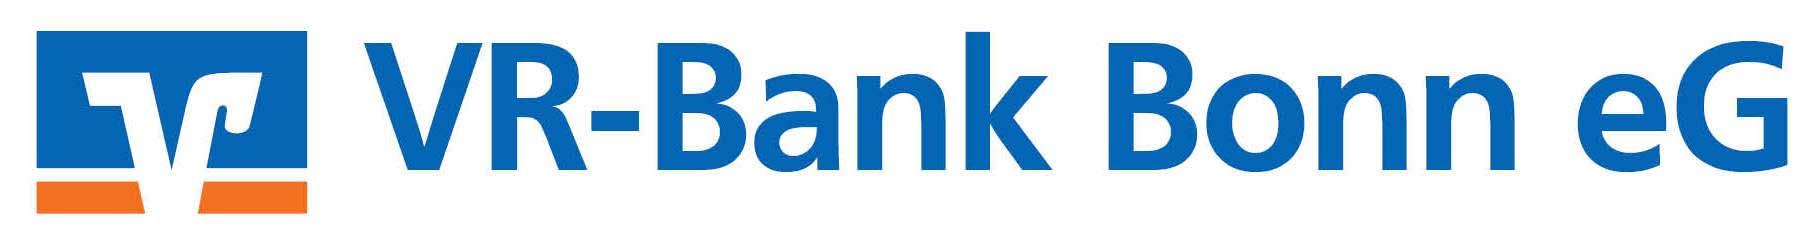 firmierung-vr-bank-bonn